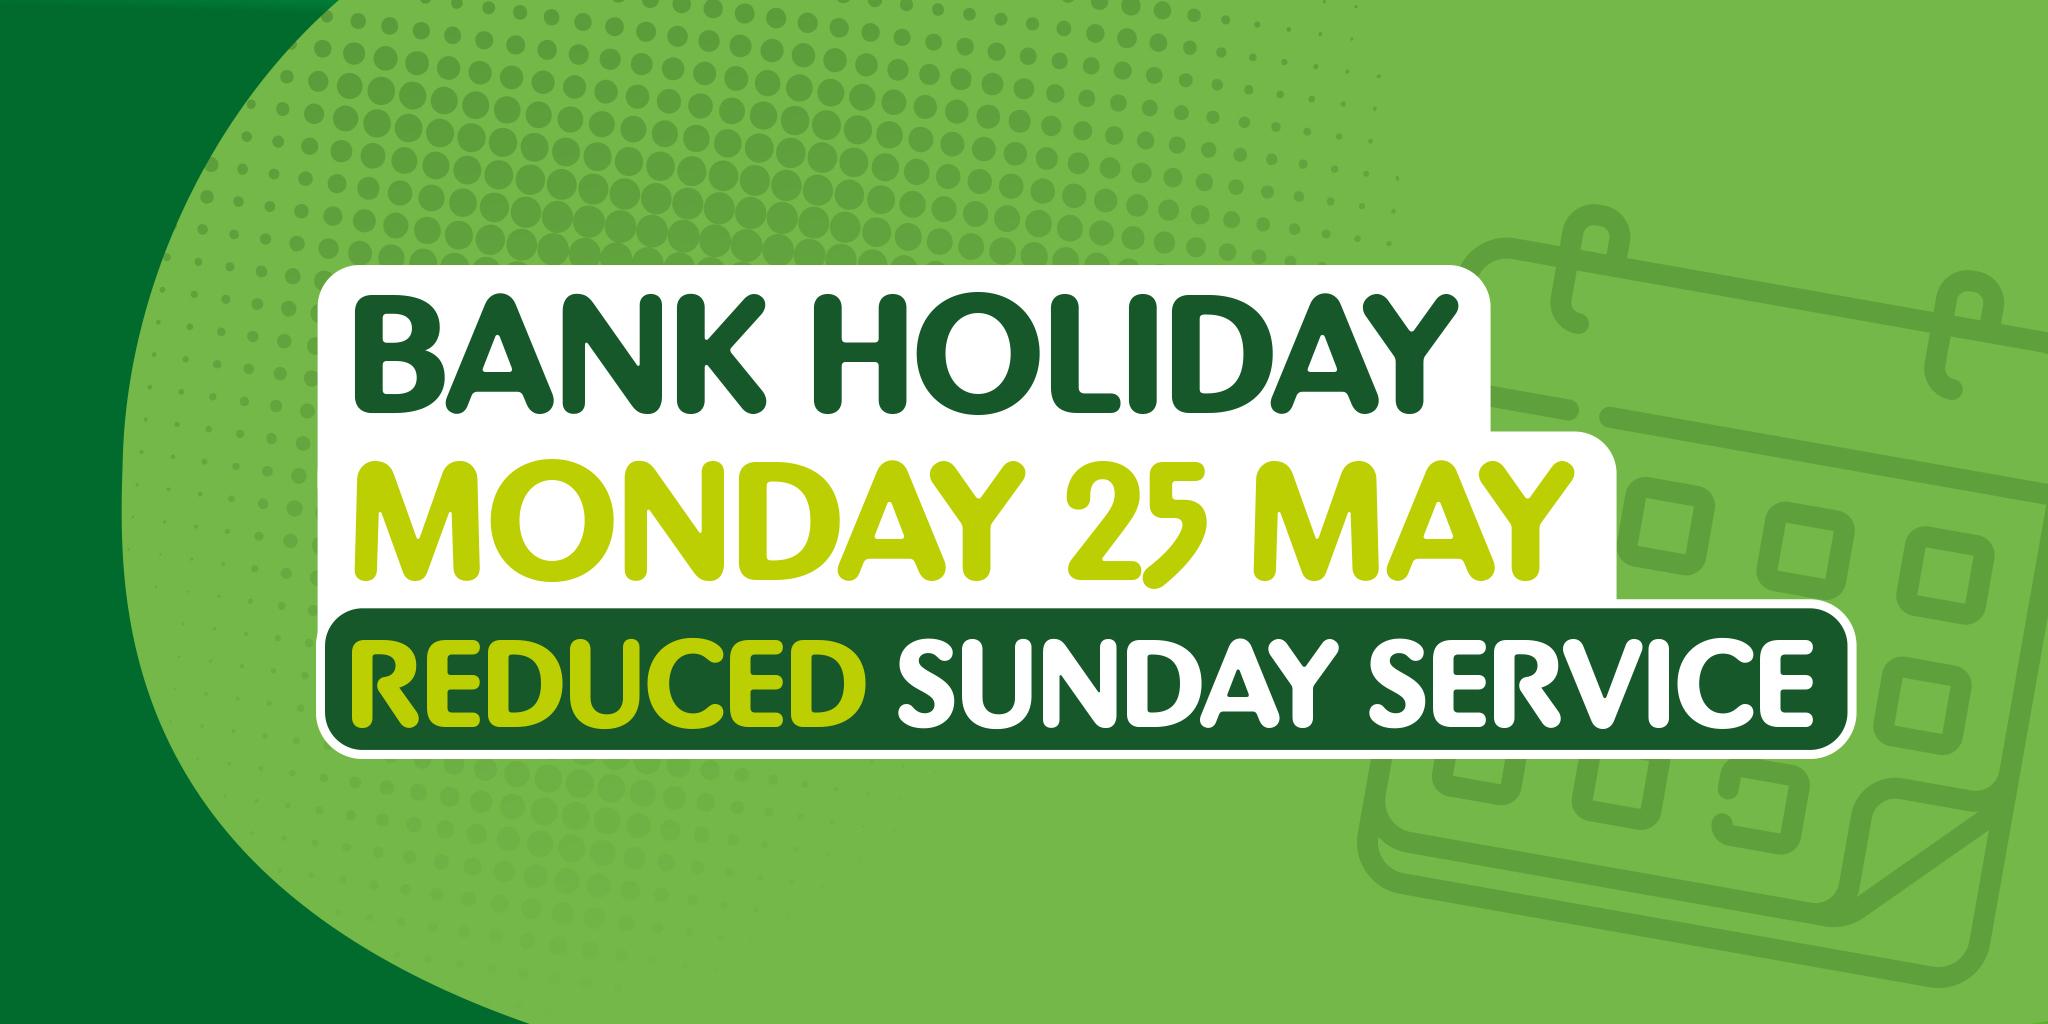 Image reading 'Bank Holiday - Monday 25th May - Reduced Sunday service'